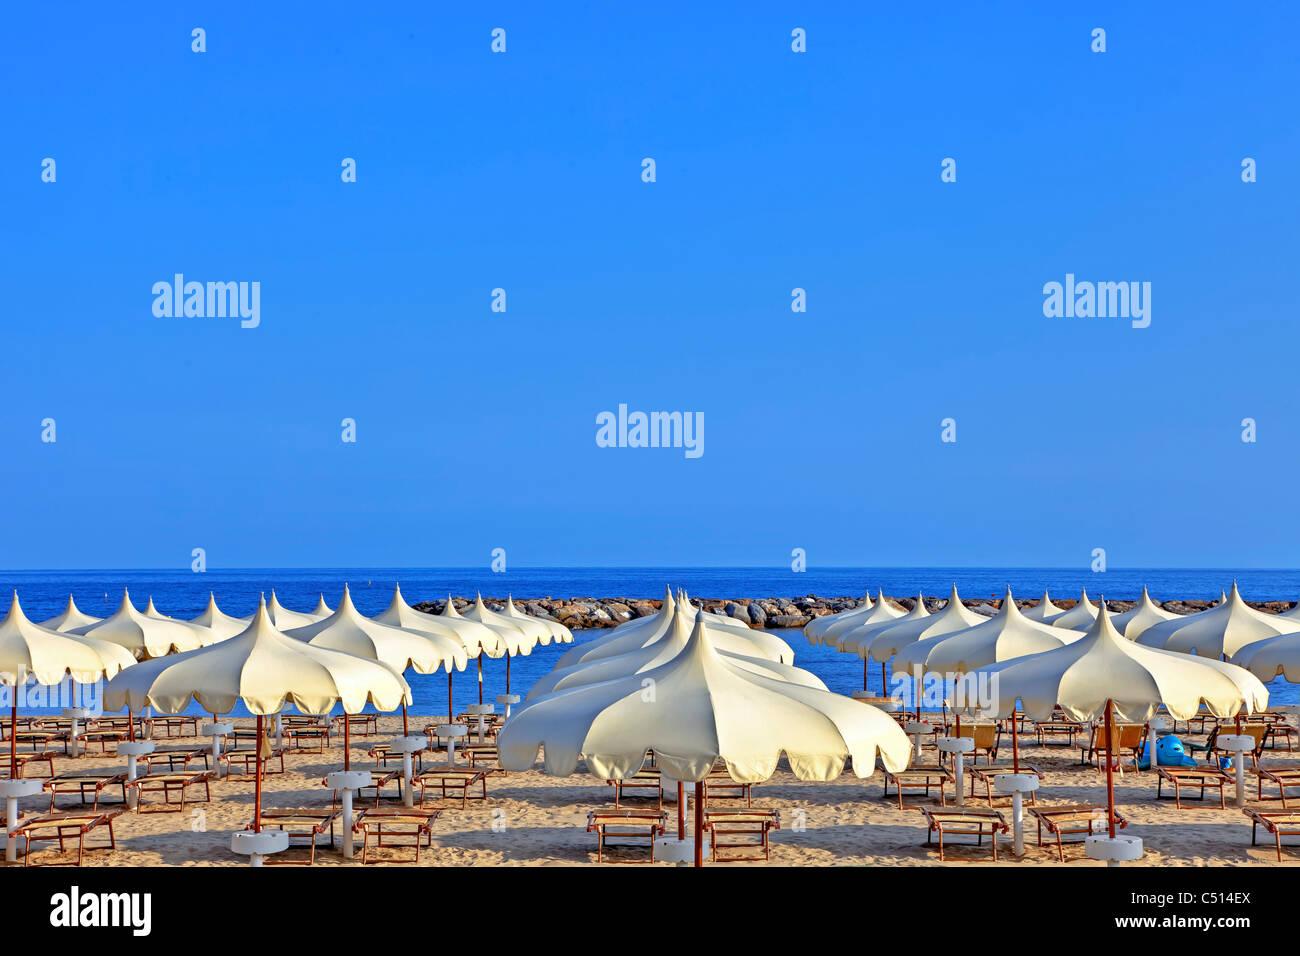 Umbrellas of the beaches on the beach of Arma di Taggia in Liguria on the Mediterranean - Stock Image